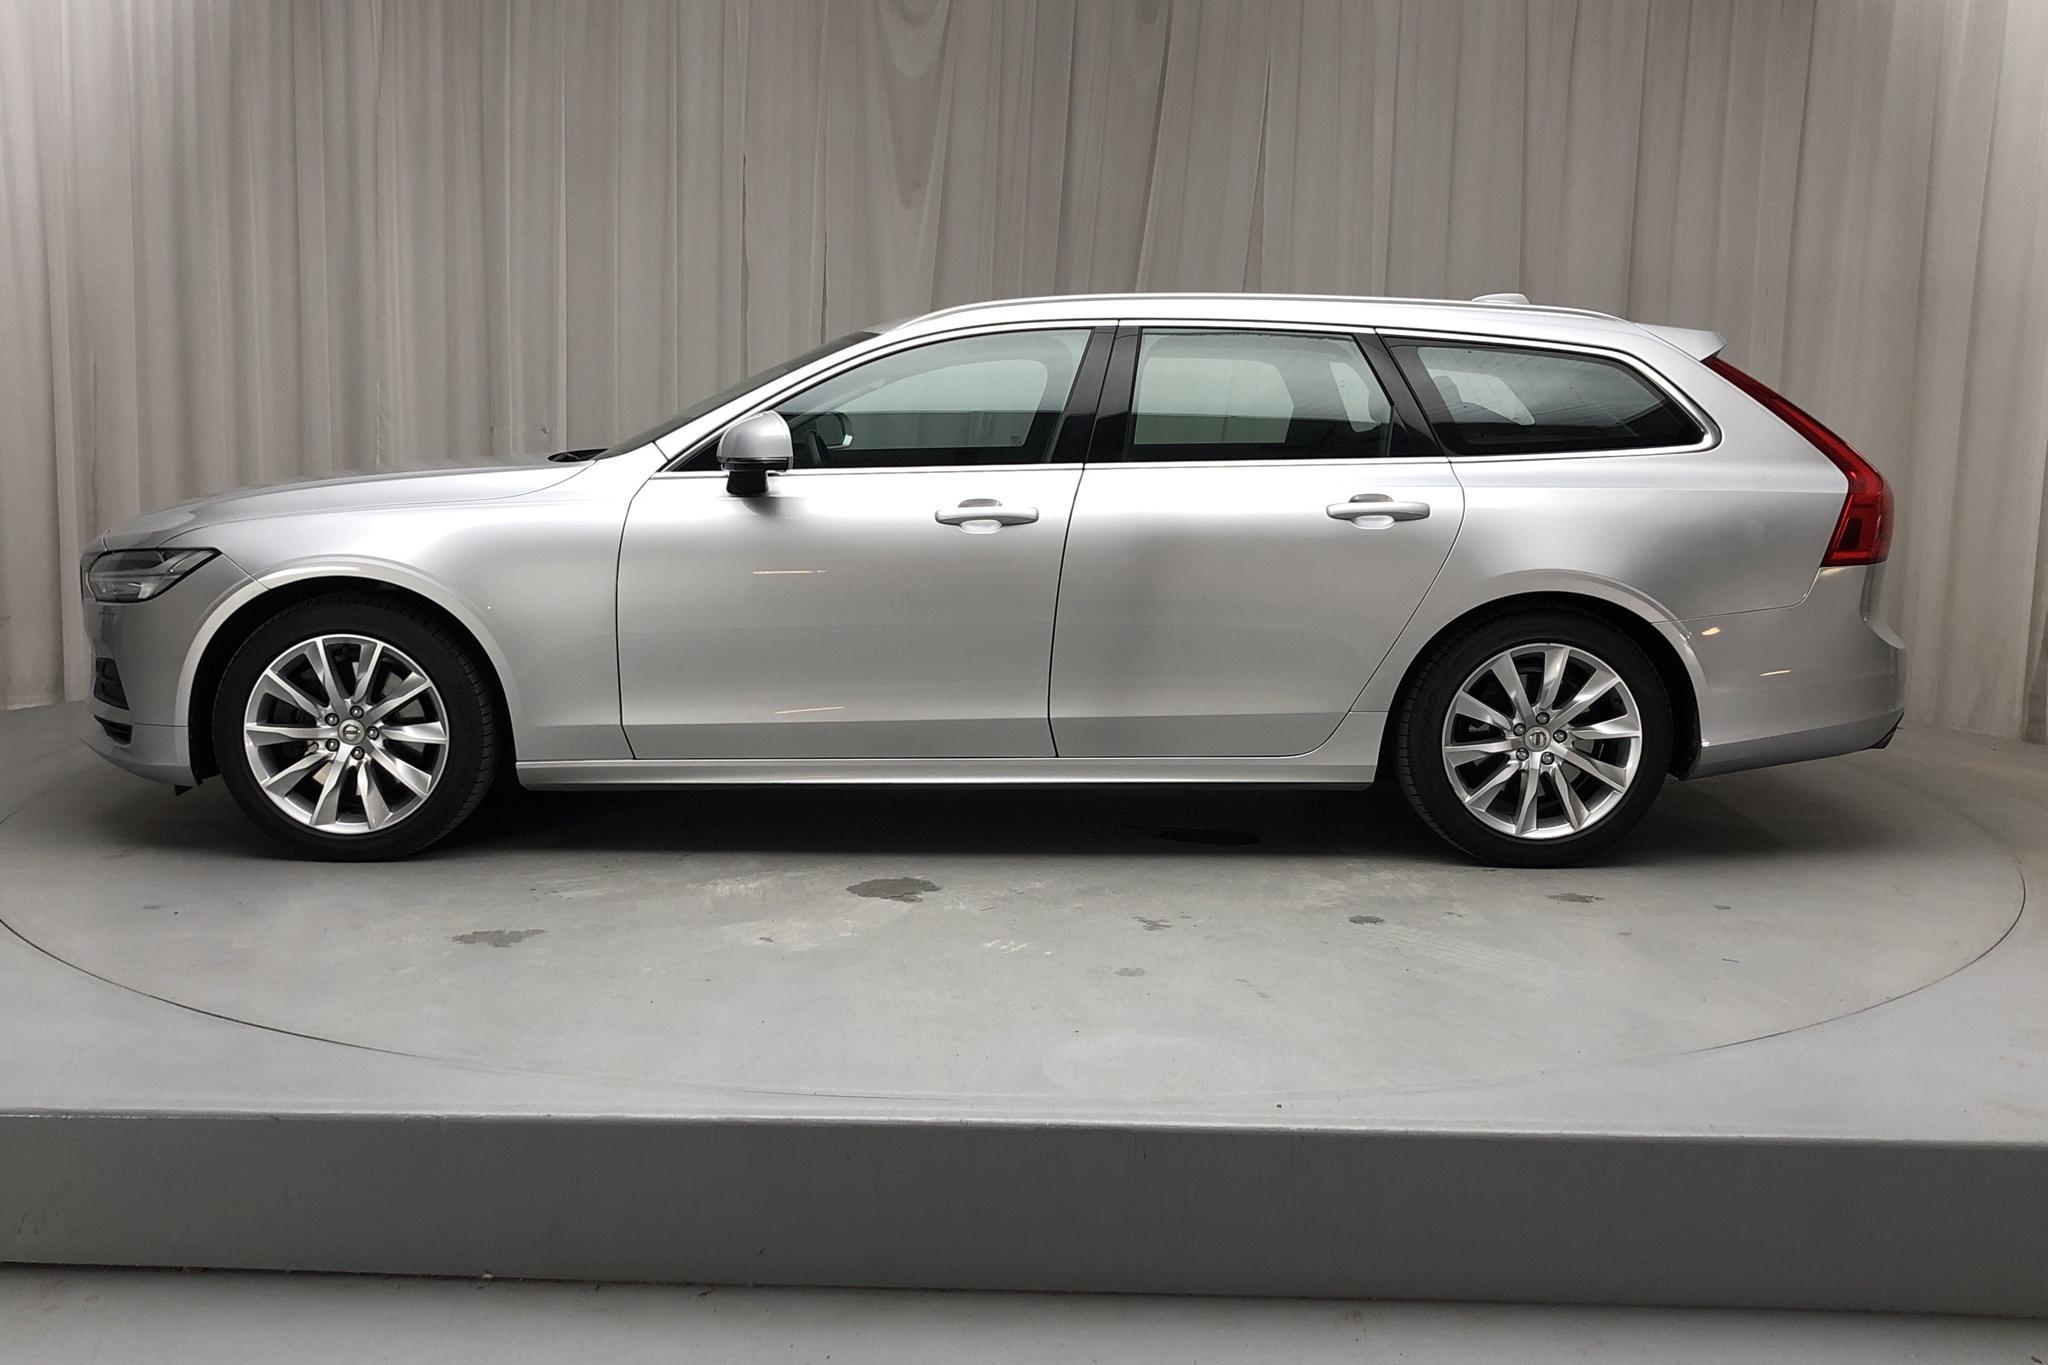 Volvo V90 T4 (190hk) - 56 130 km - Automatic - silver - 2019